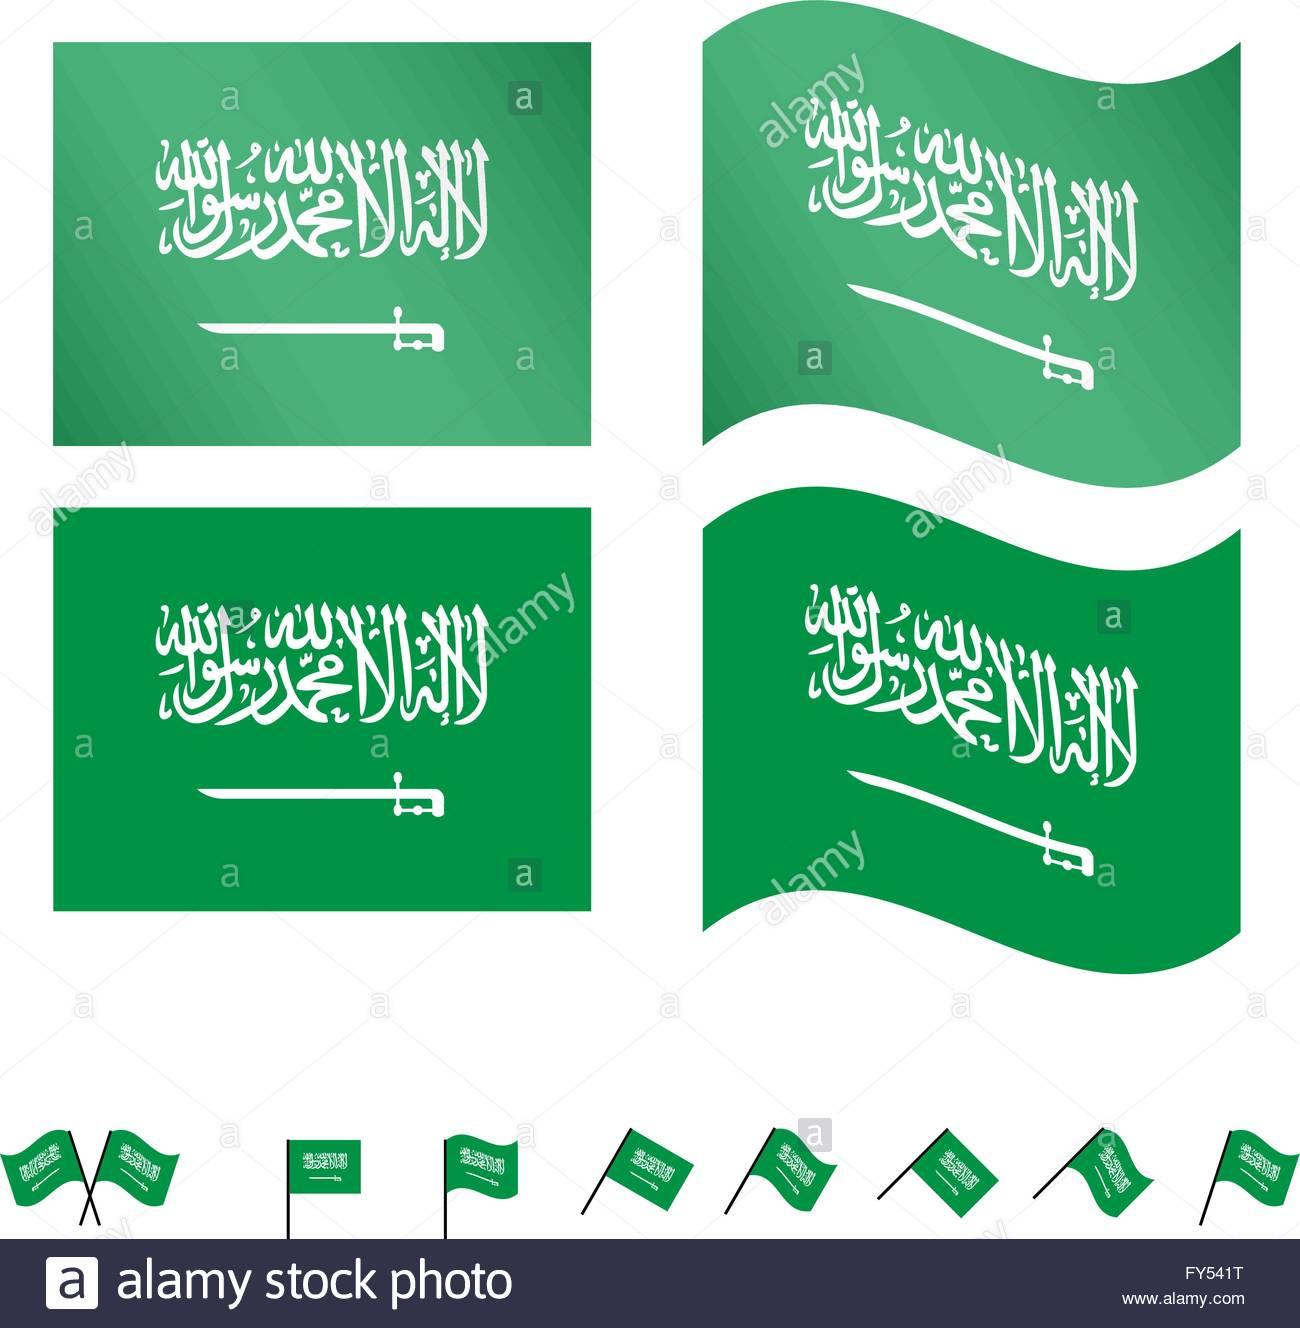 Saudi Arabia Flags EPS 10 - Stock Image